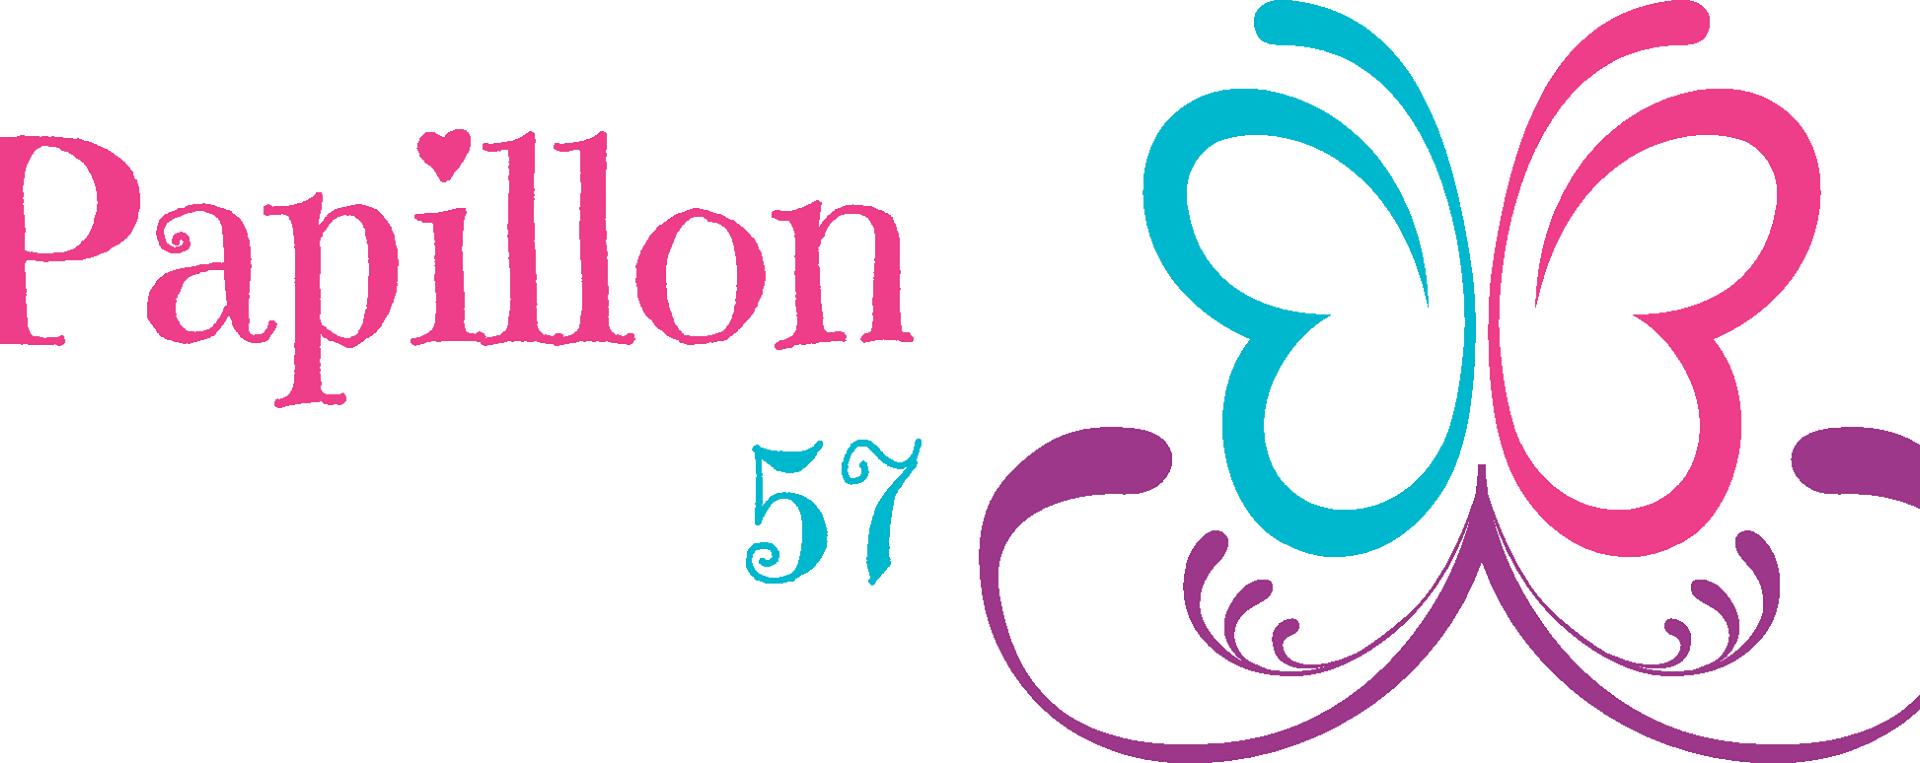 Papillon57